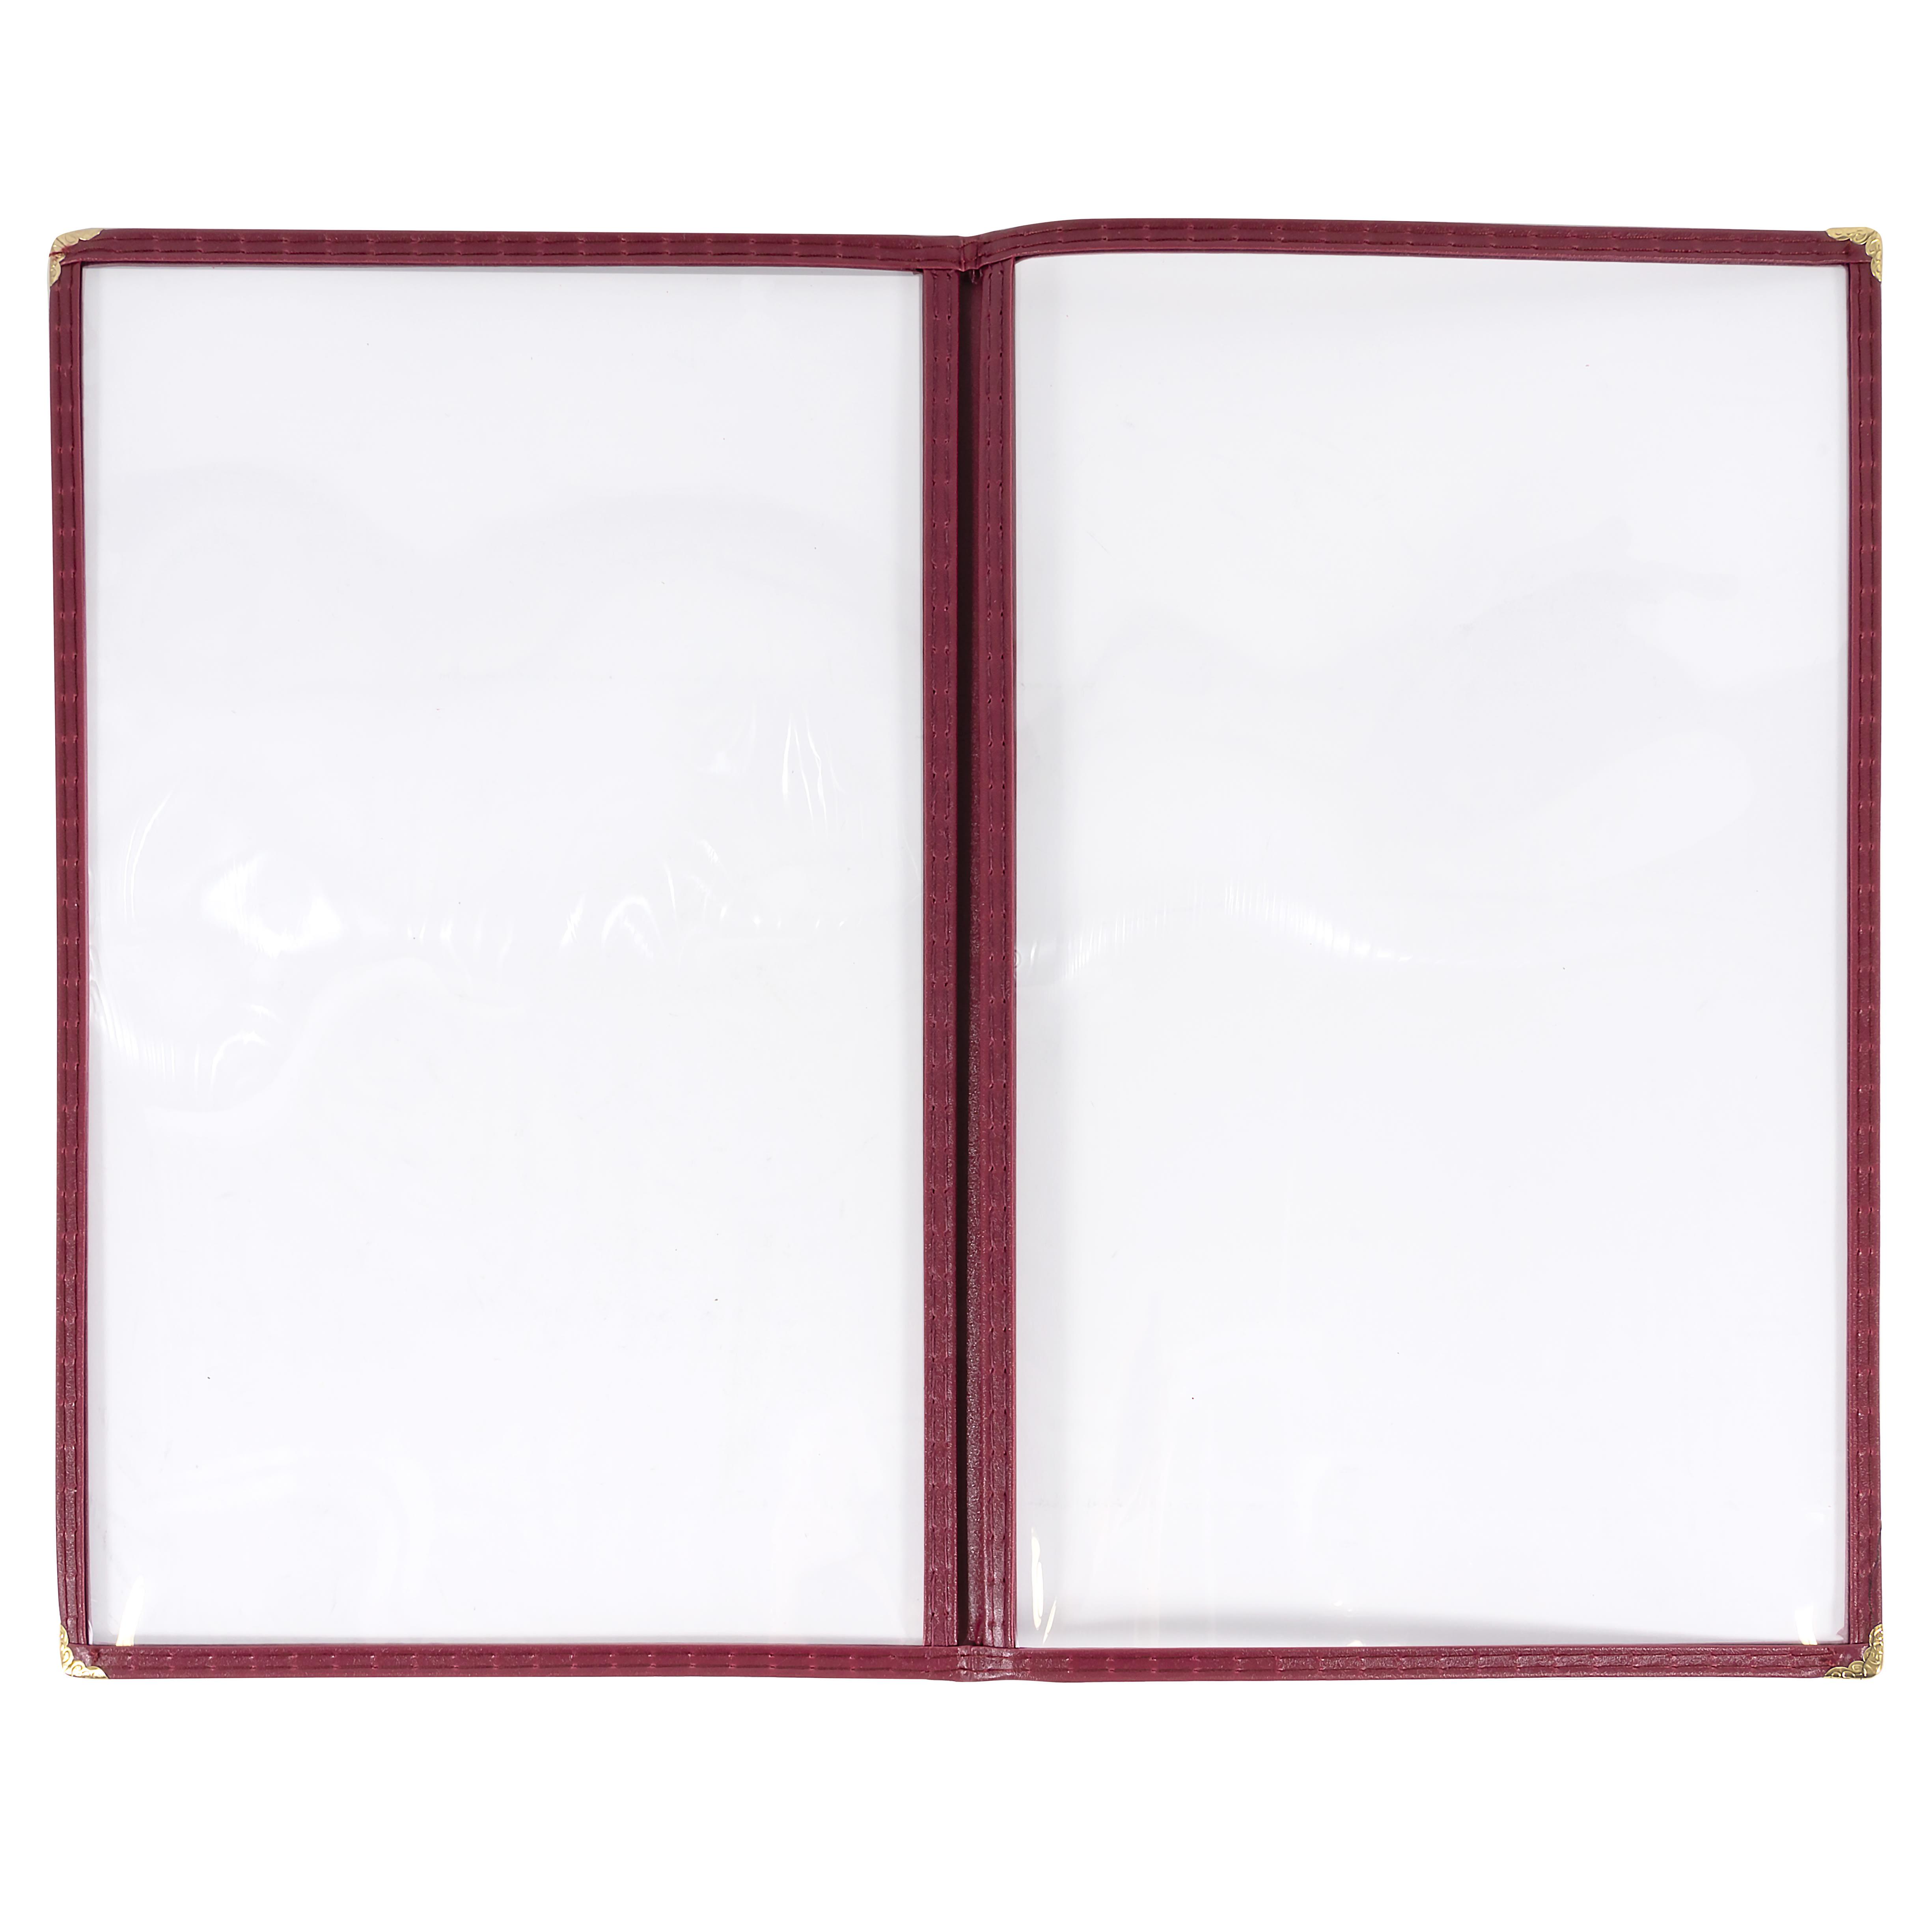 "Winco PMCD-14U Double-Fold Menu Cover, 8.5 x 14"", Burgundy"